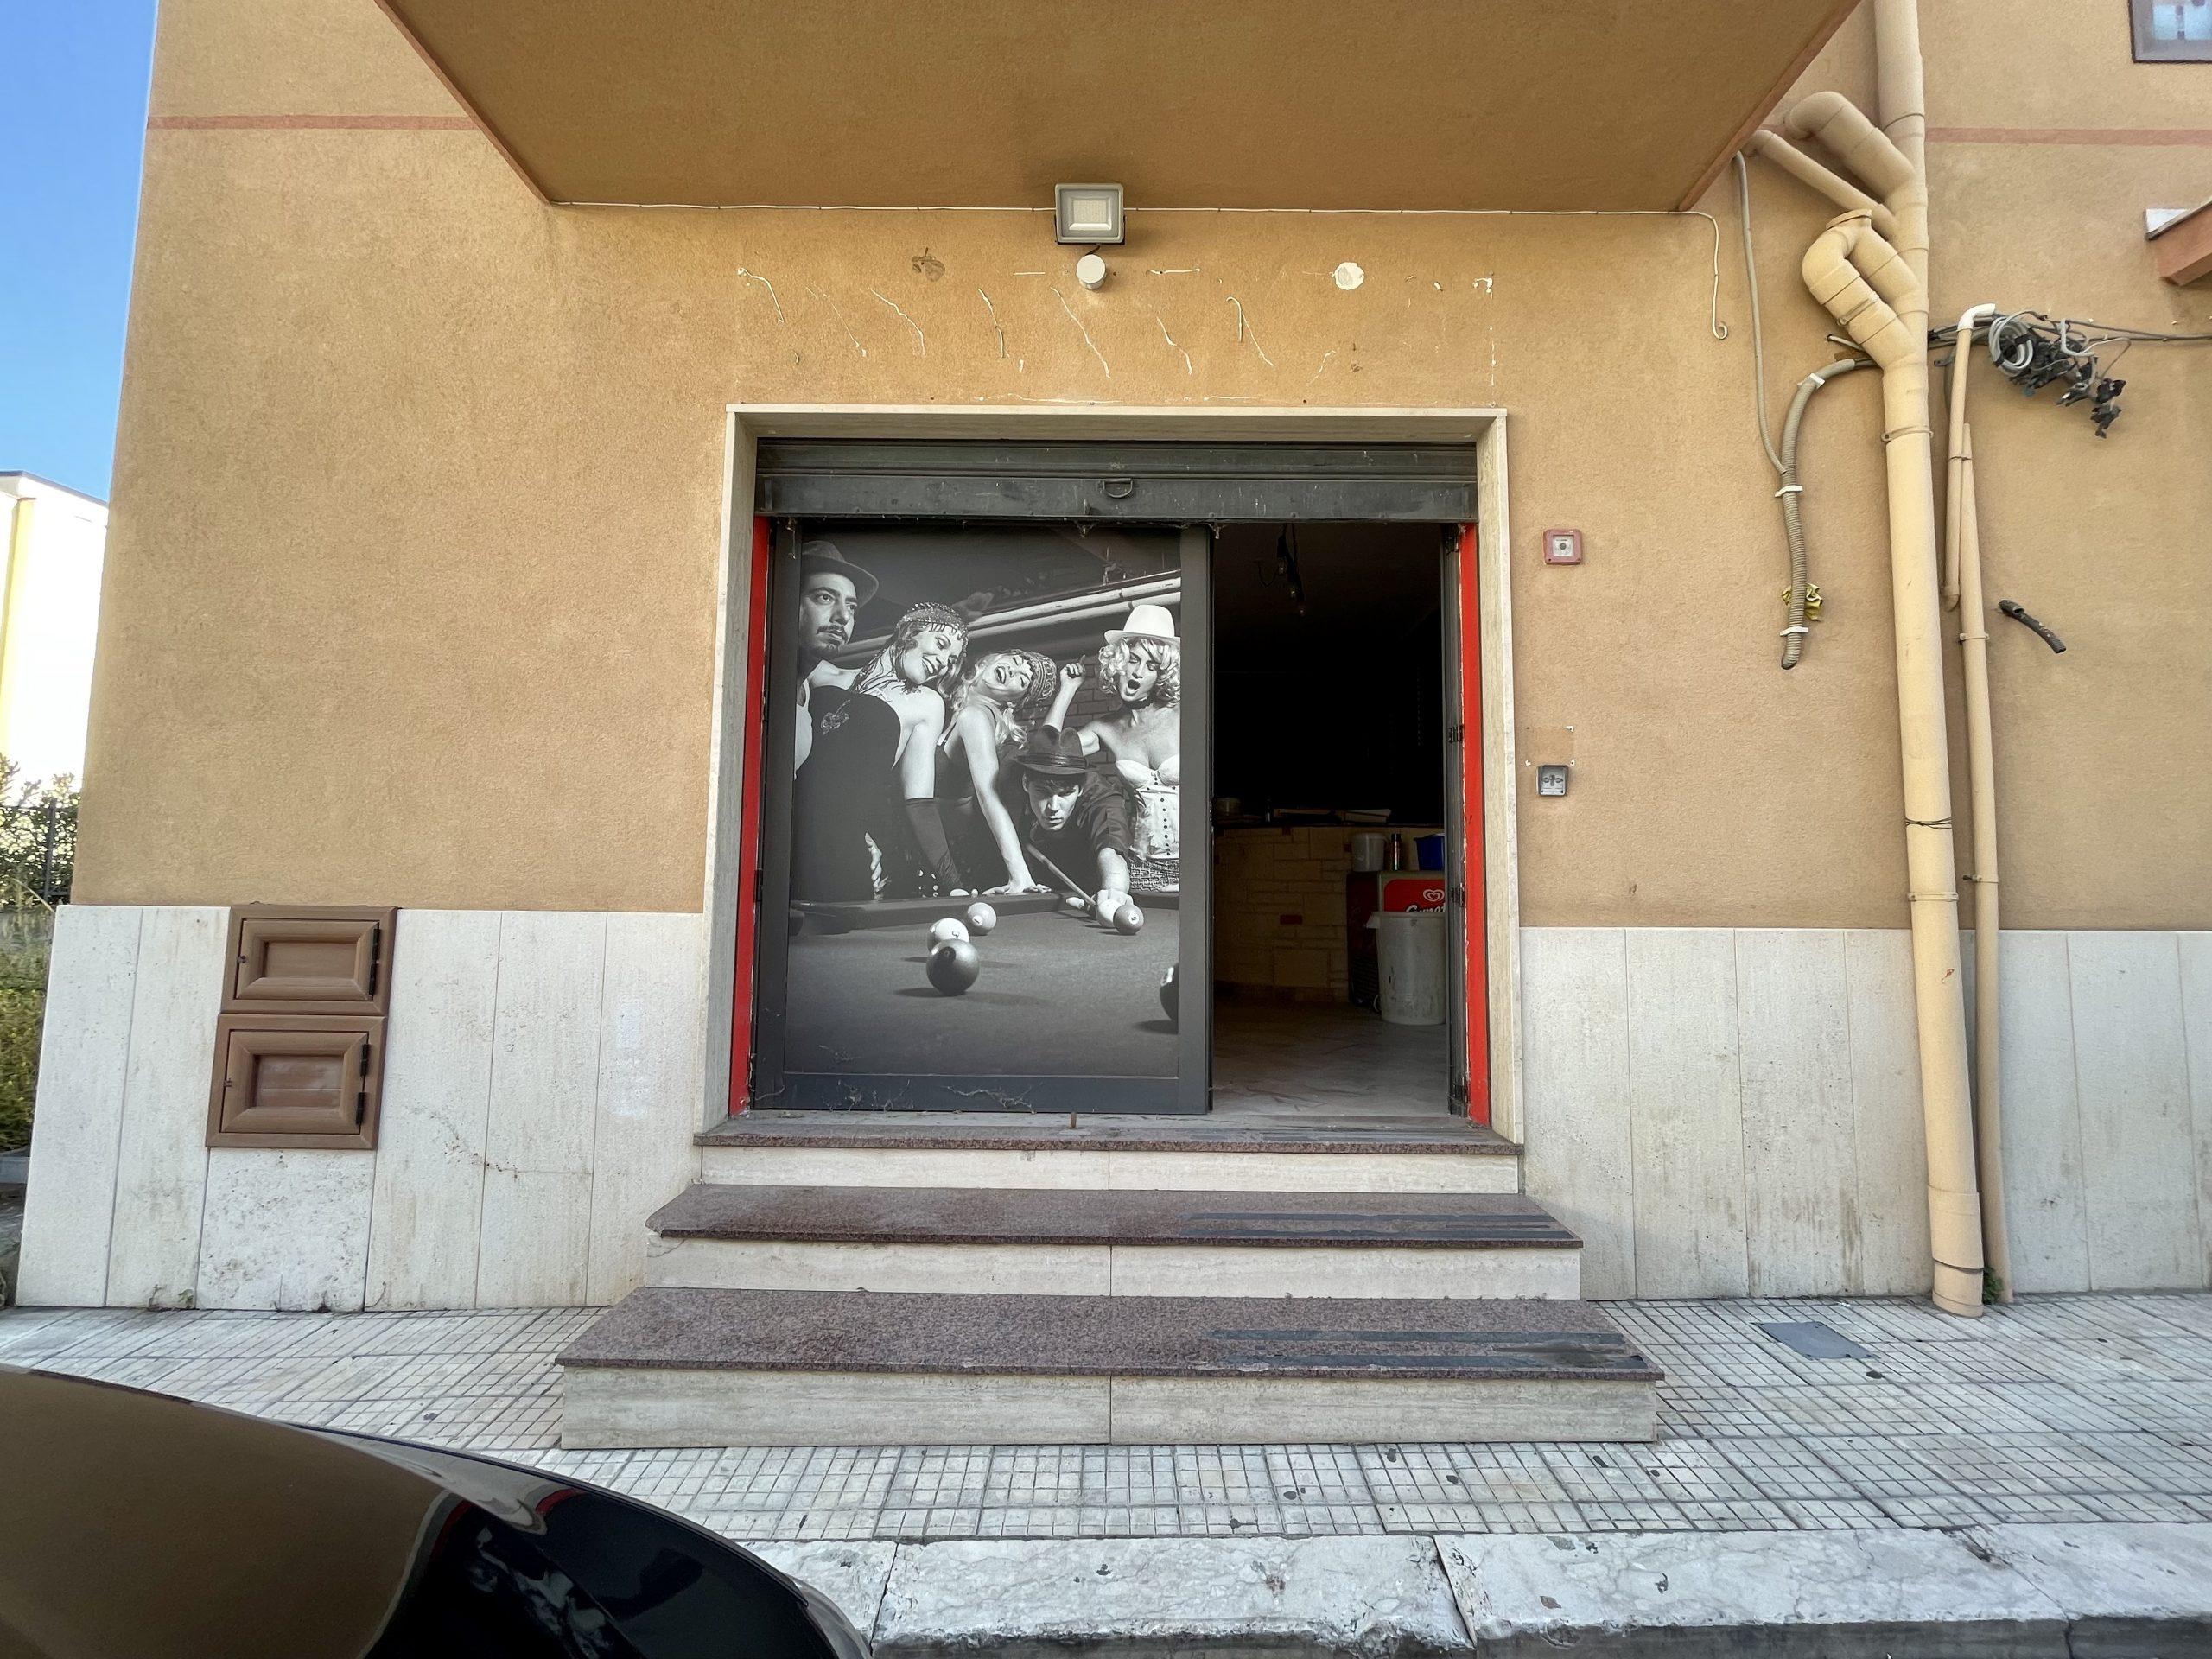 Locale commerciale a Partinico, Via Torricelli